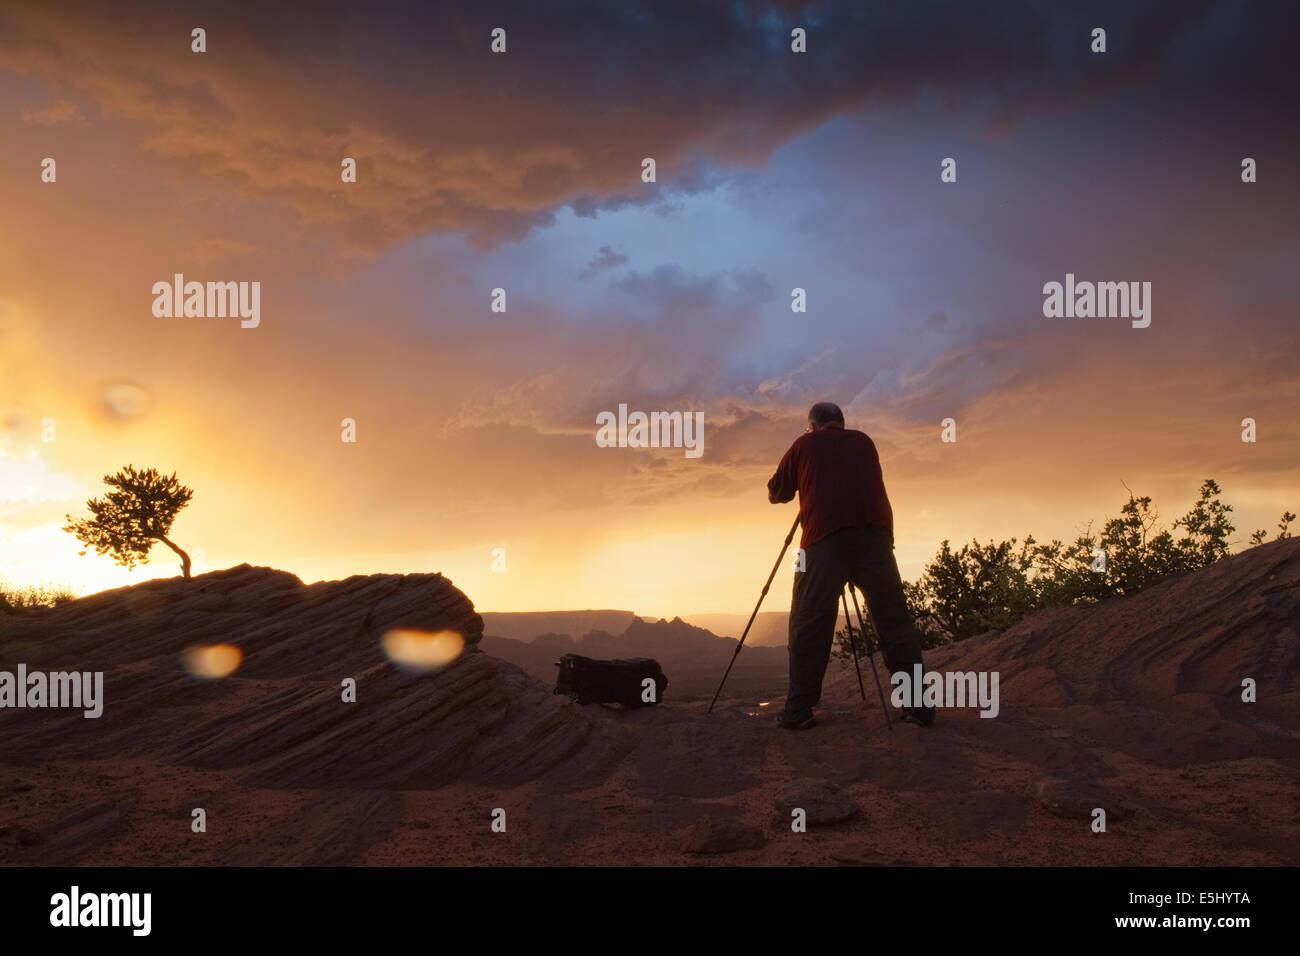 Photography in an Arizonan Rainstorm - Stock Image